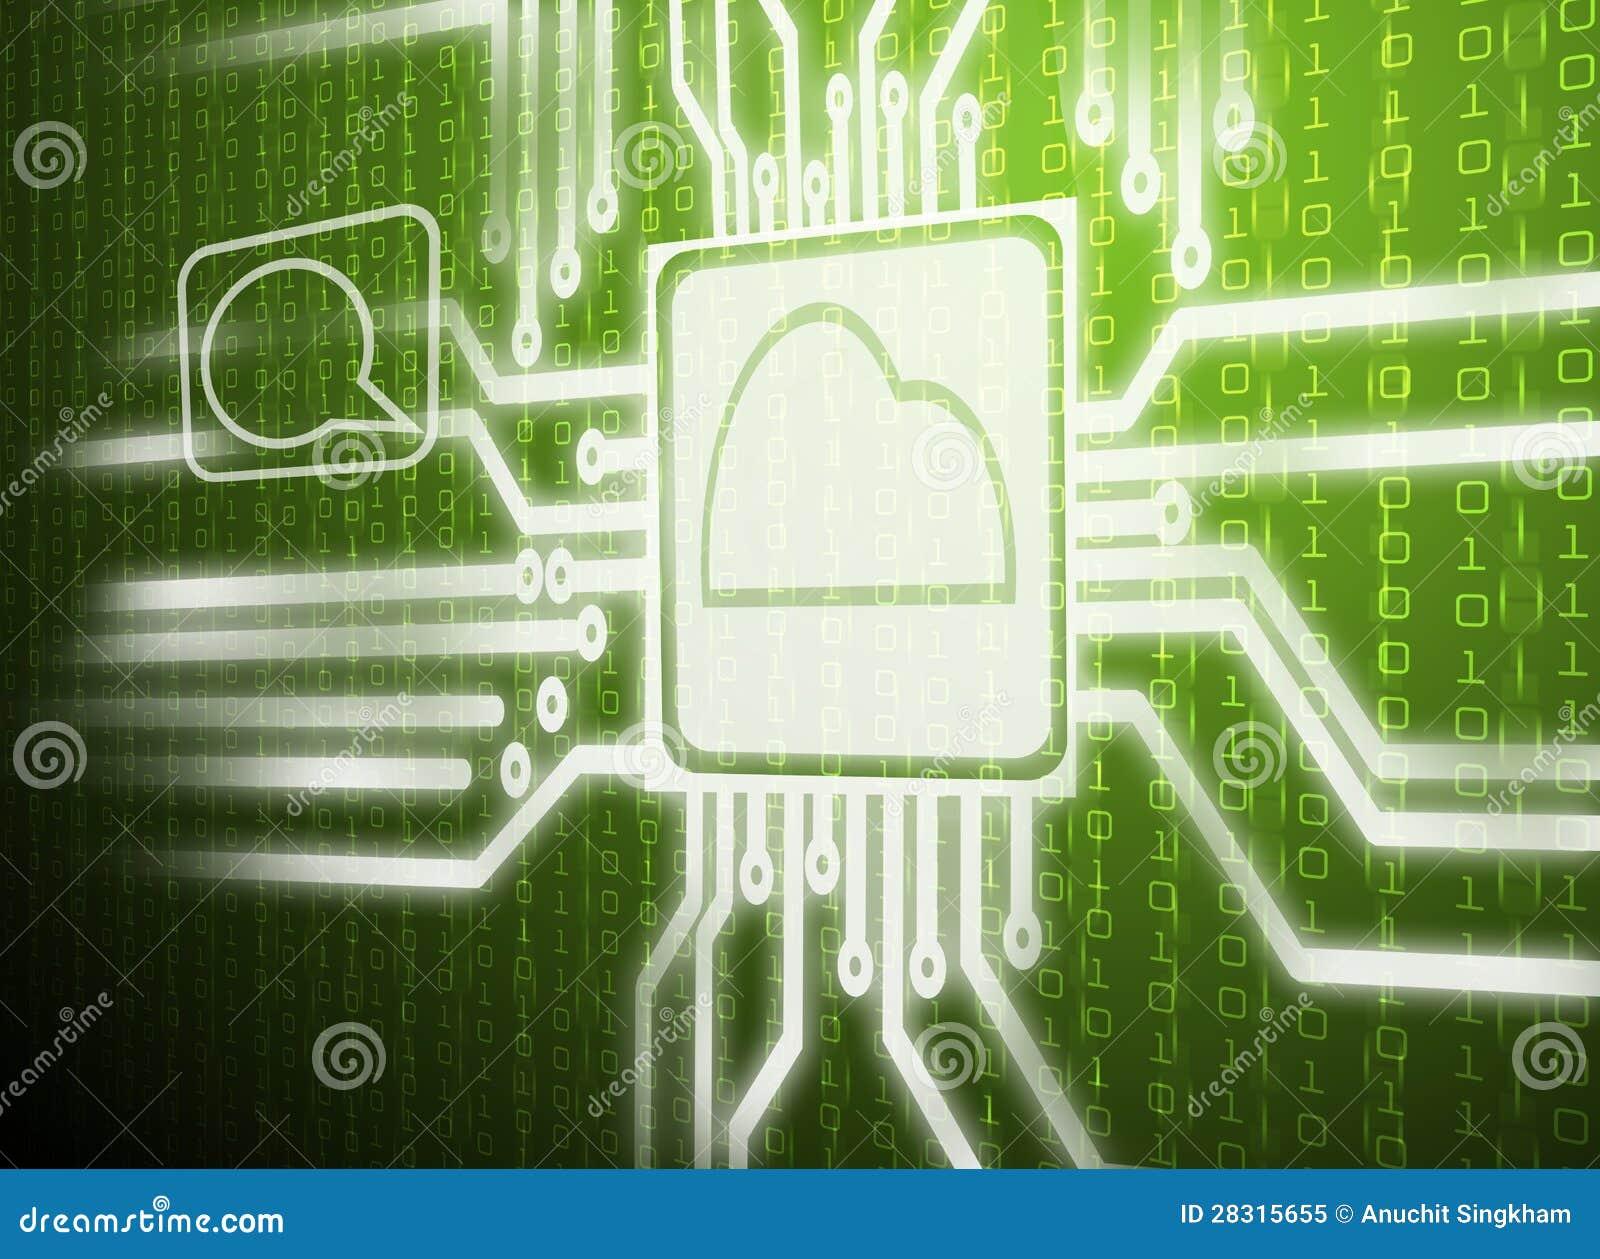 abstract green cloud computing stock image